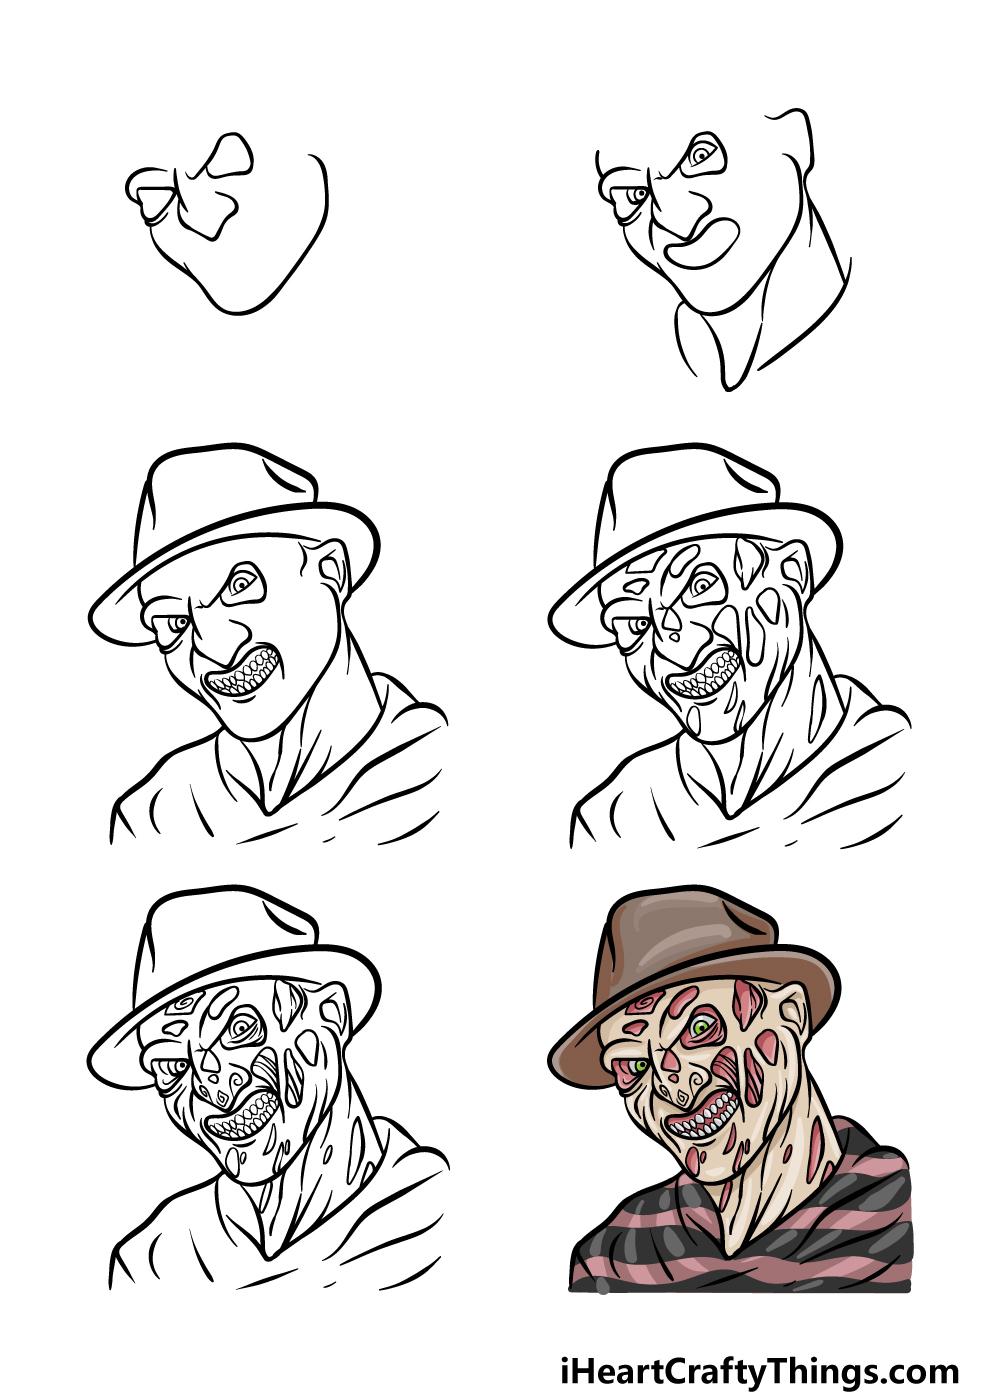 How To Draw Freddy Krueger in 6 steps